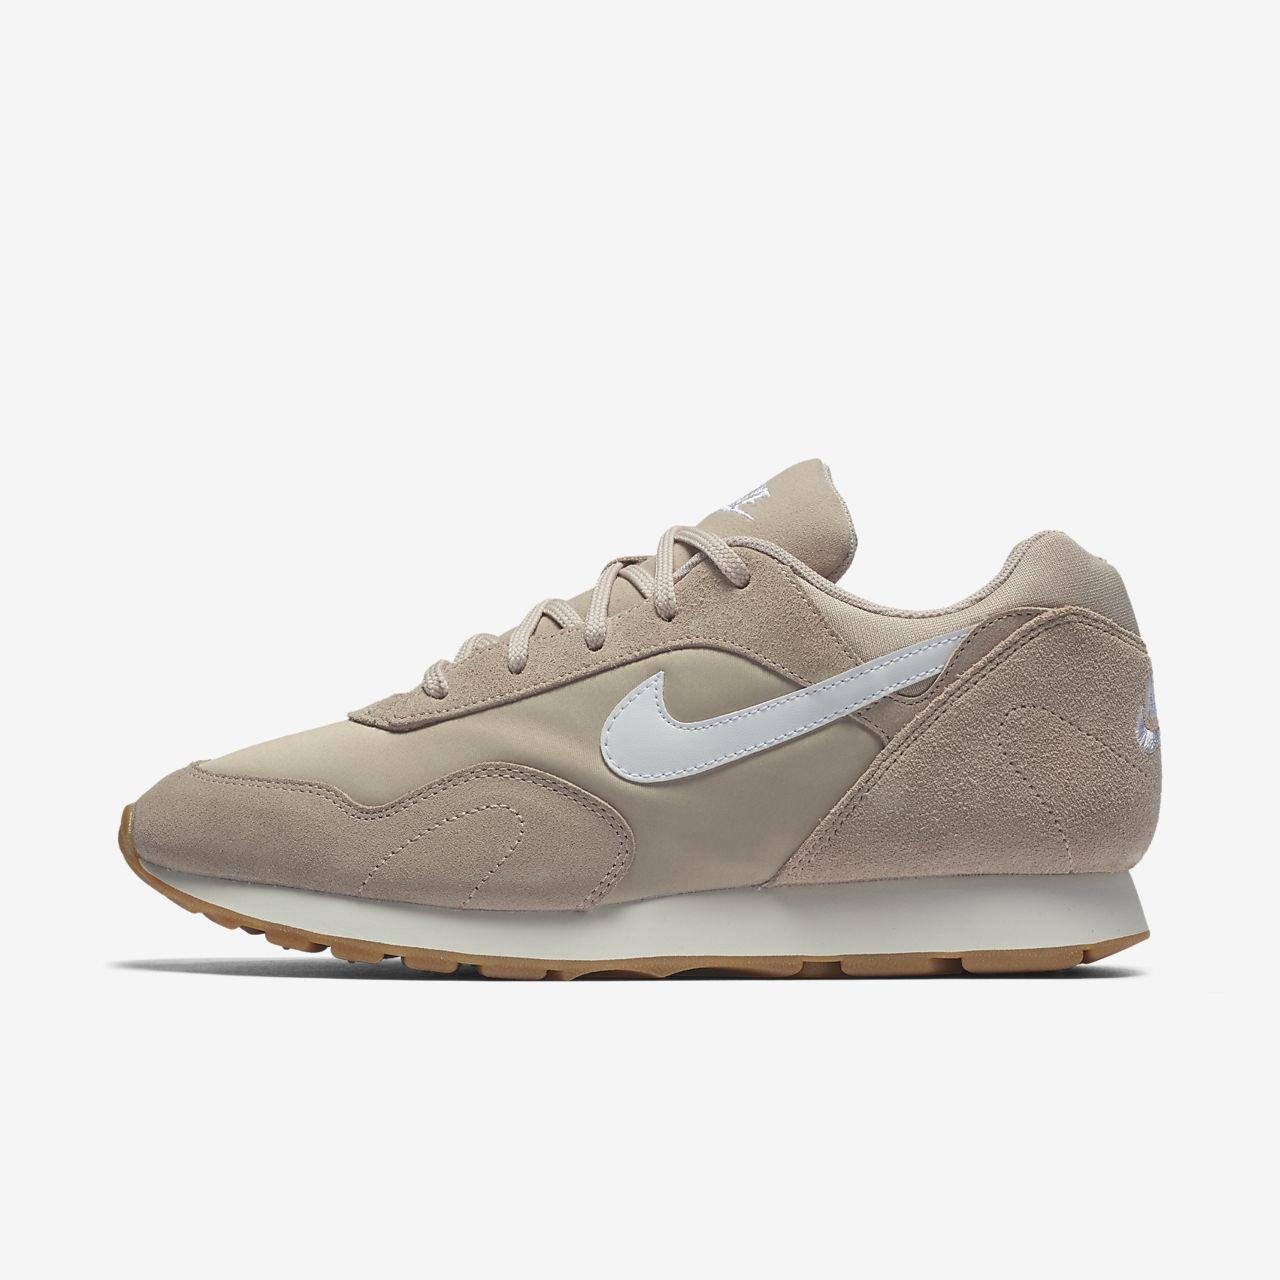 Nike Outburst Women's Shoe